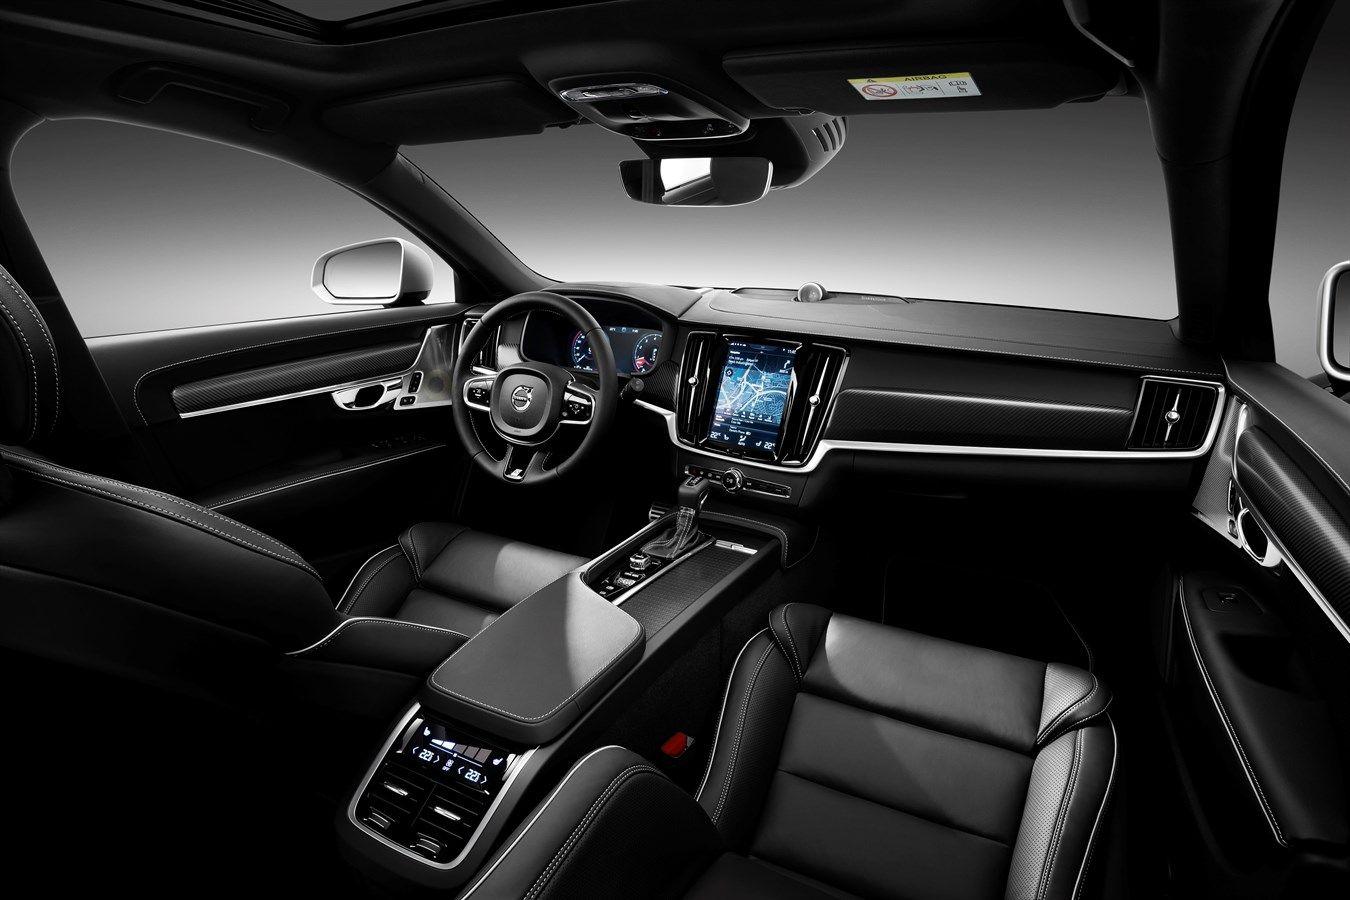 Awesome Volvo V90 R Design Interior And View Di 2020